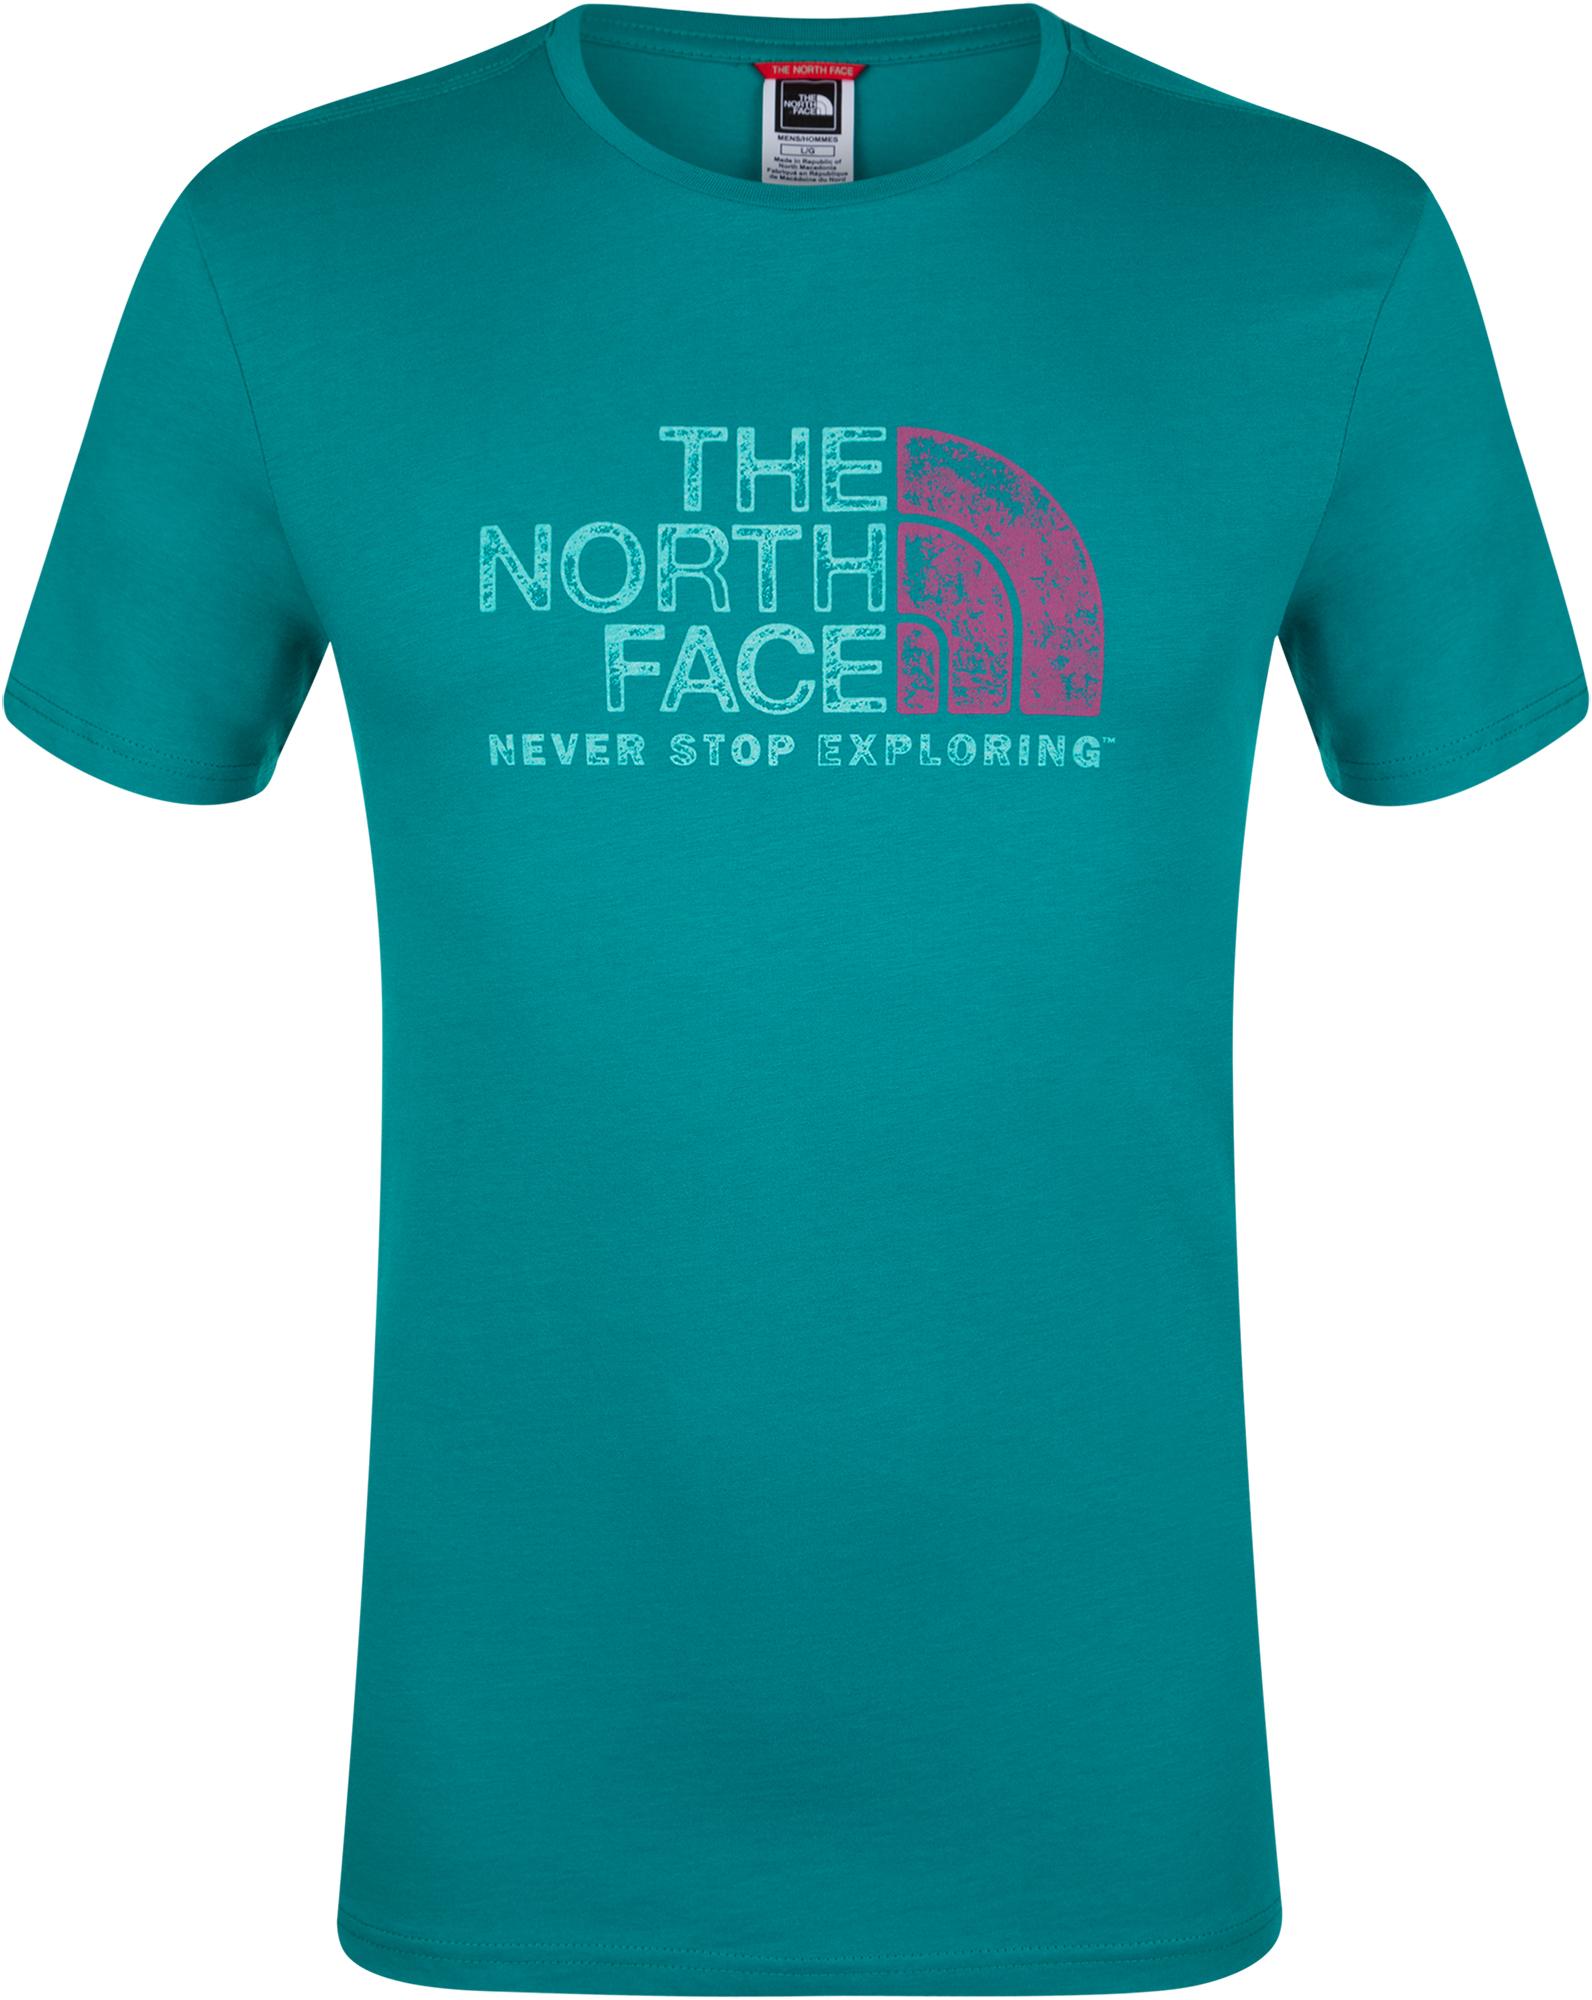 цена The North Face Футболка мужская The North Face Rust 2, размер 50 онлайн в 2017 году